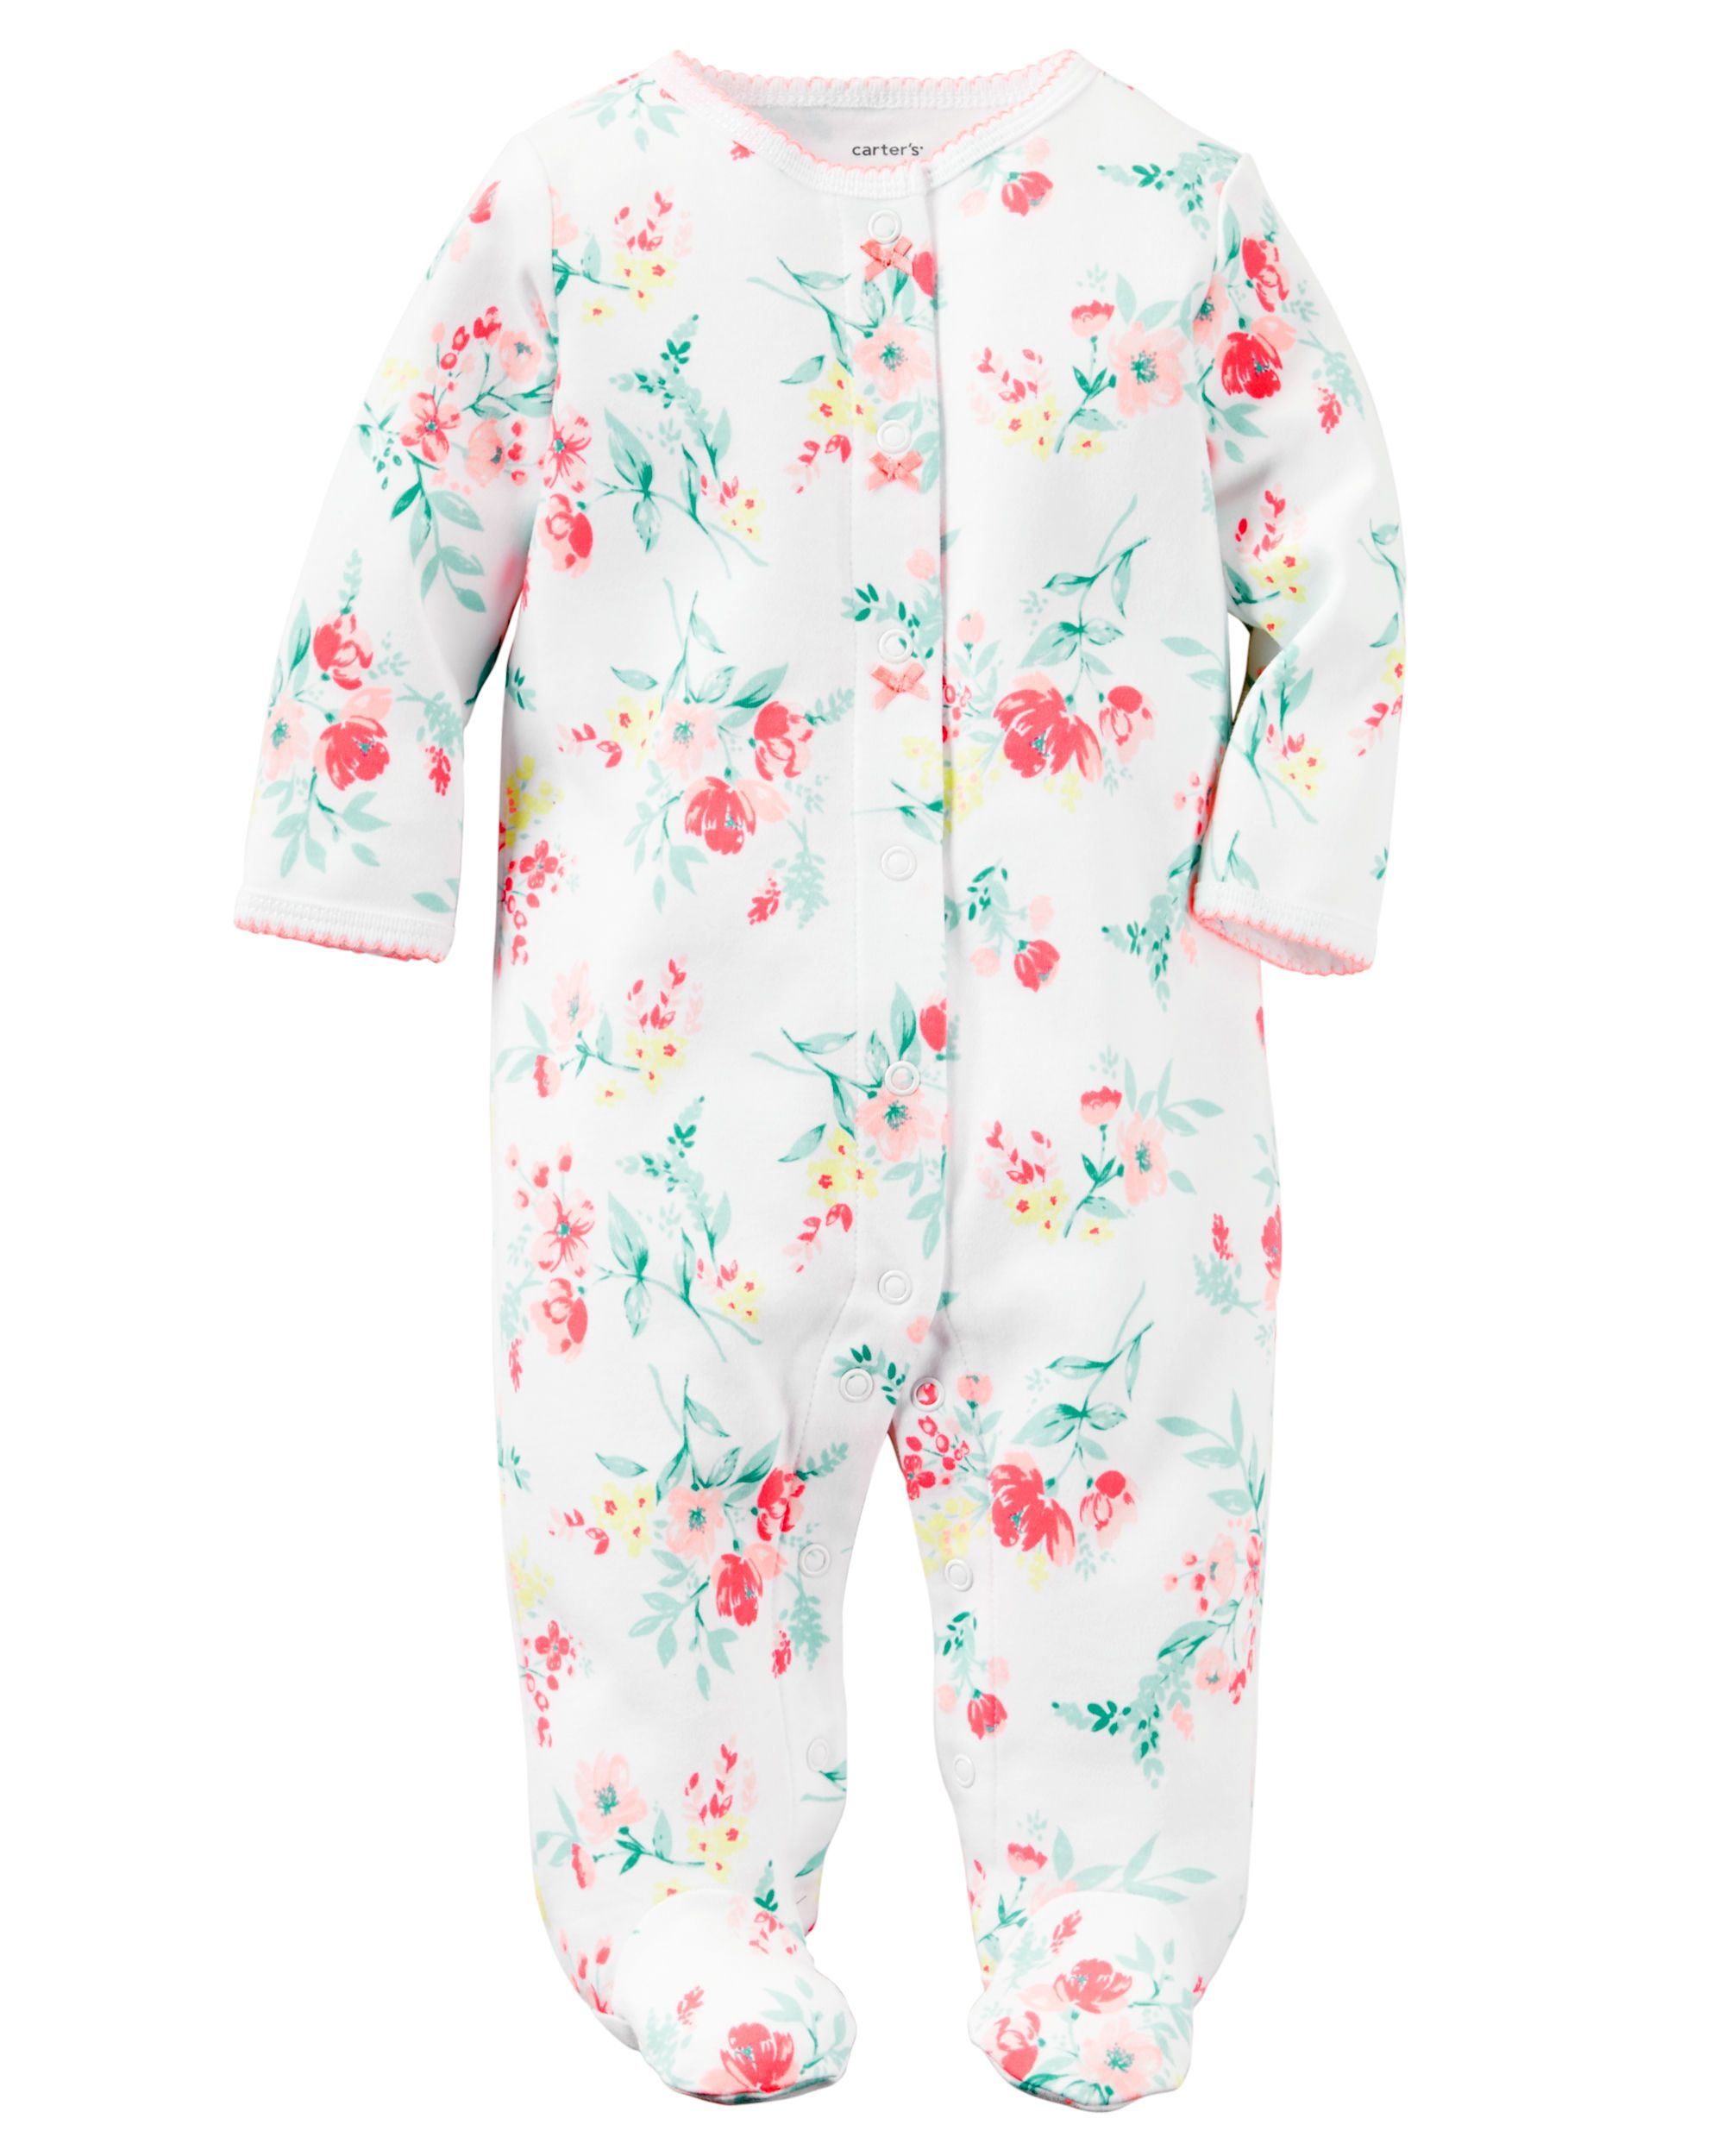 cc1c75c4bee4 Baby Girl Cotton Snap-Up Sleeper